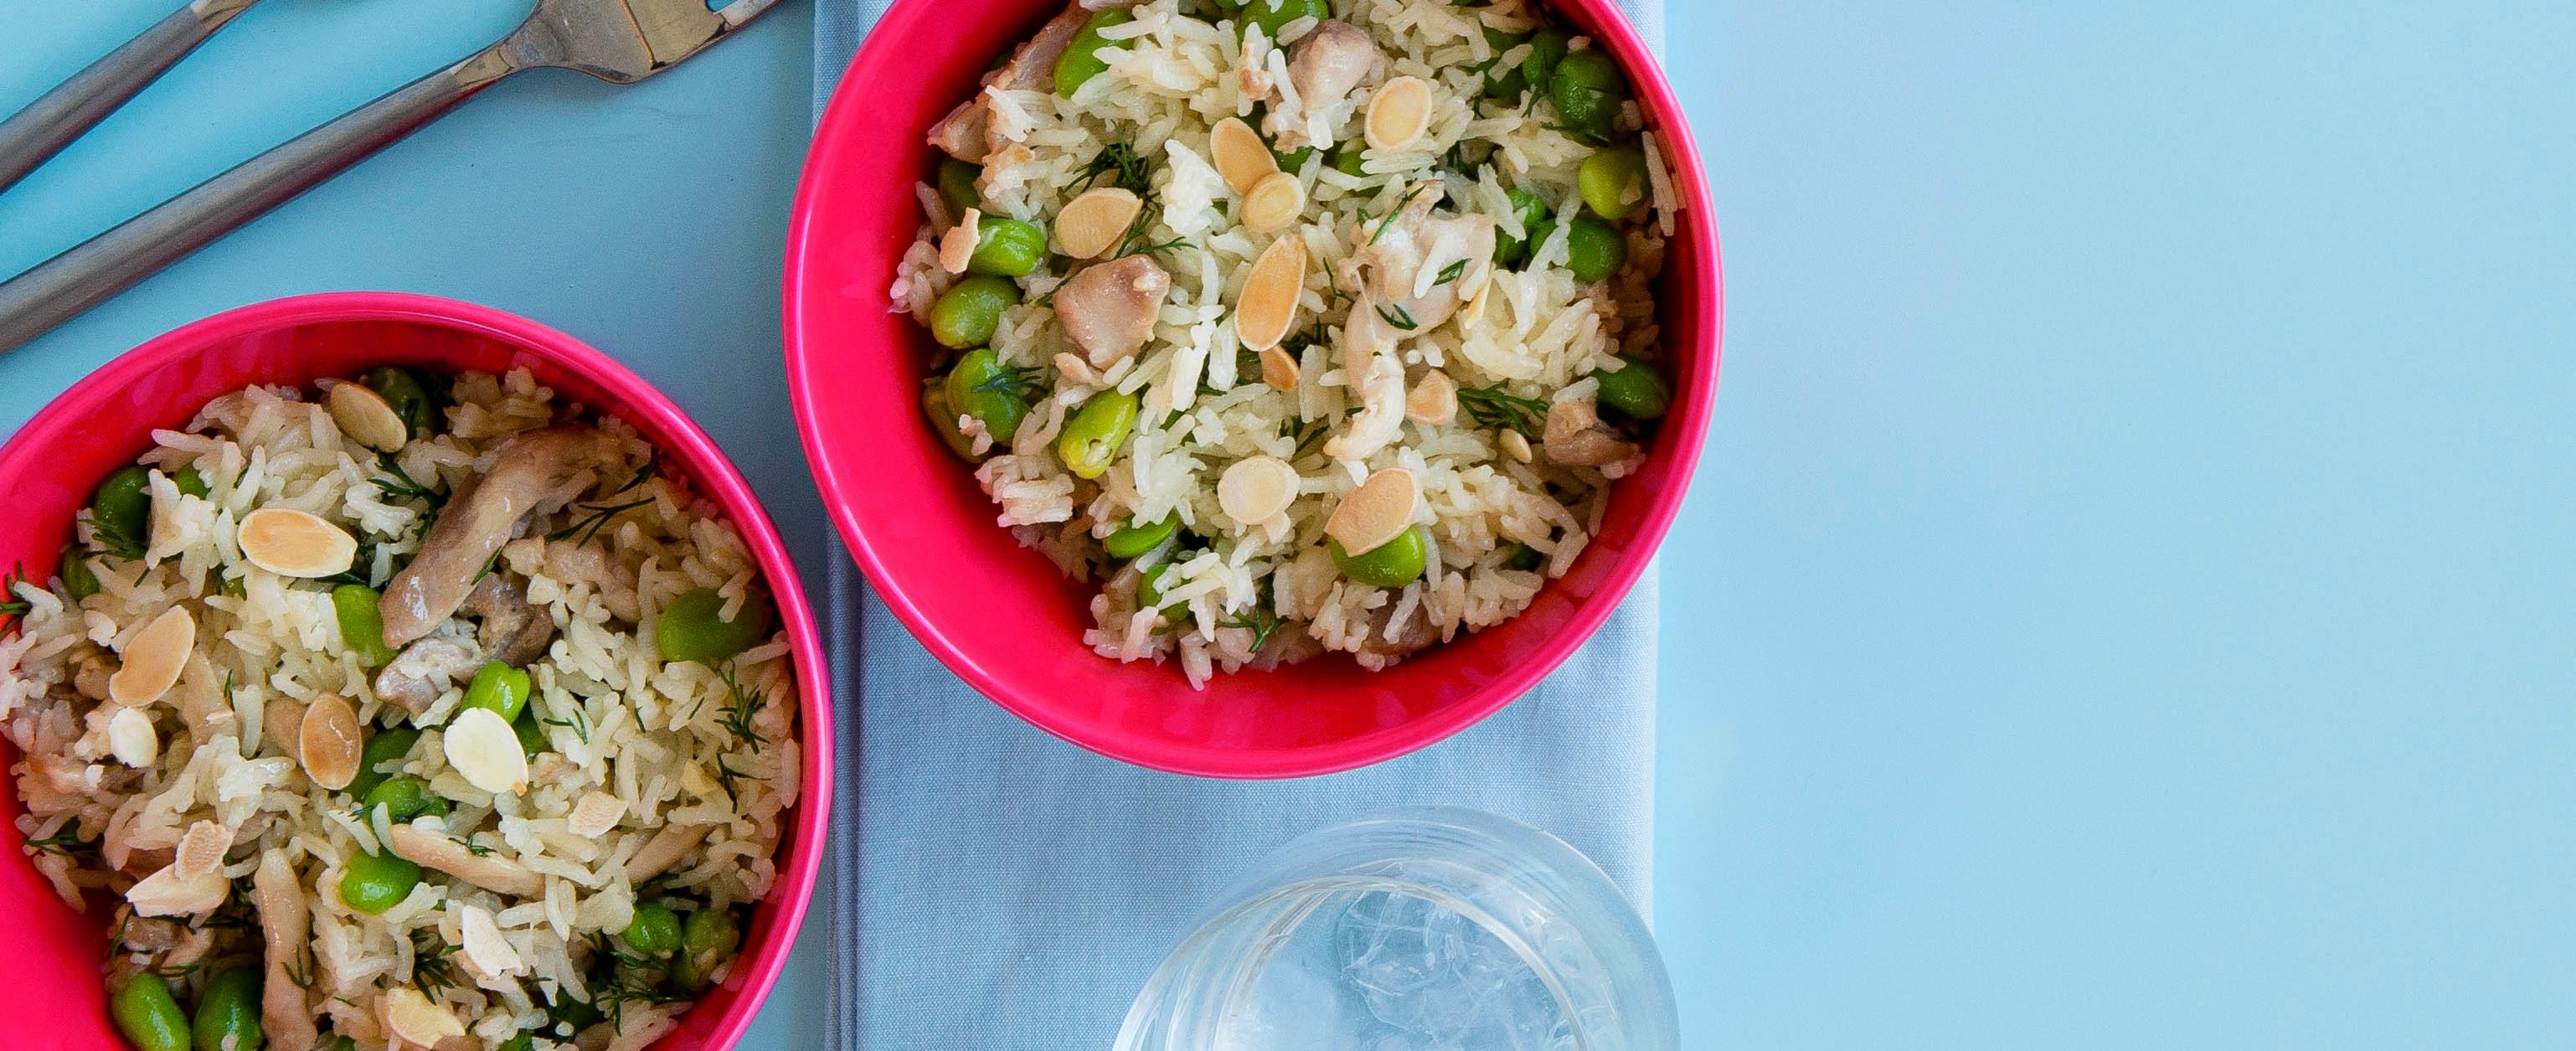 Chicken and broad bean pilaf - healthy chicken recipe